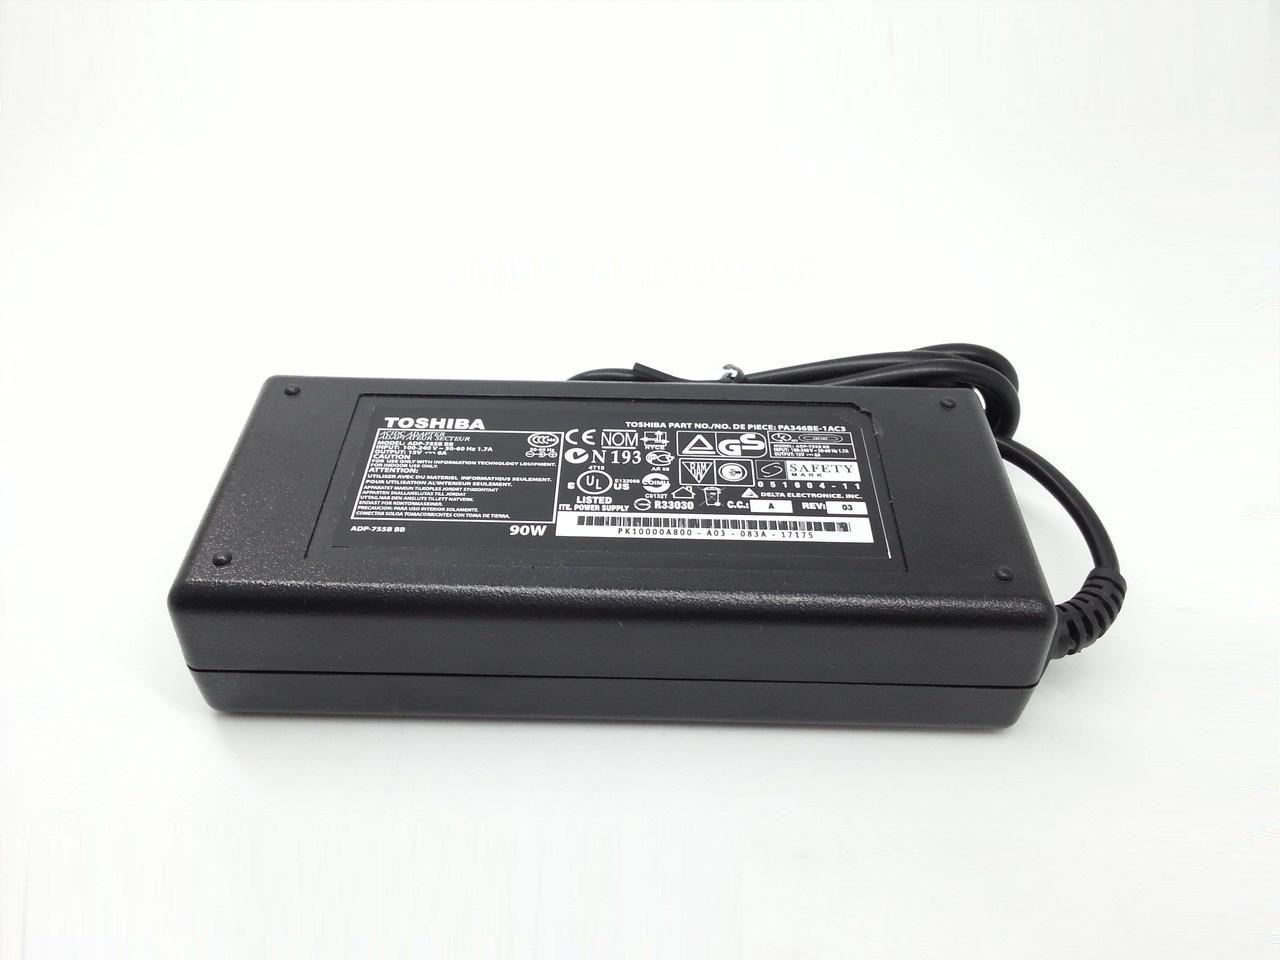 Блок питания для ноутбука Toshiba Tecra a6-ez6311  15V 6A 90W 6.3*3.0mm